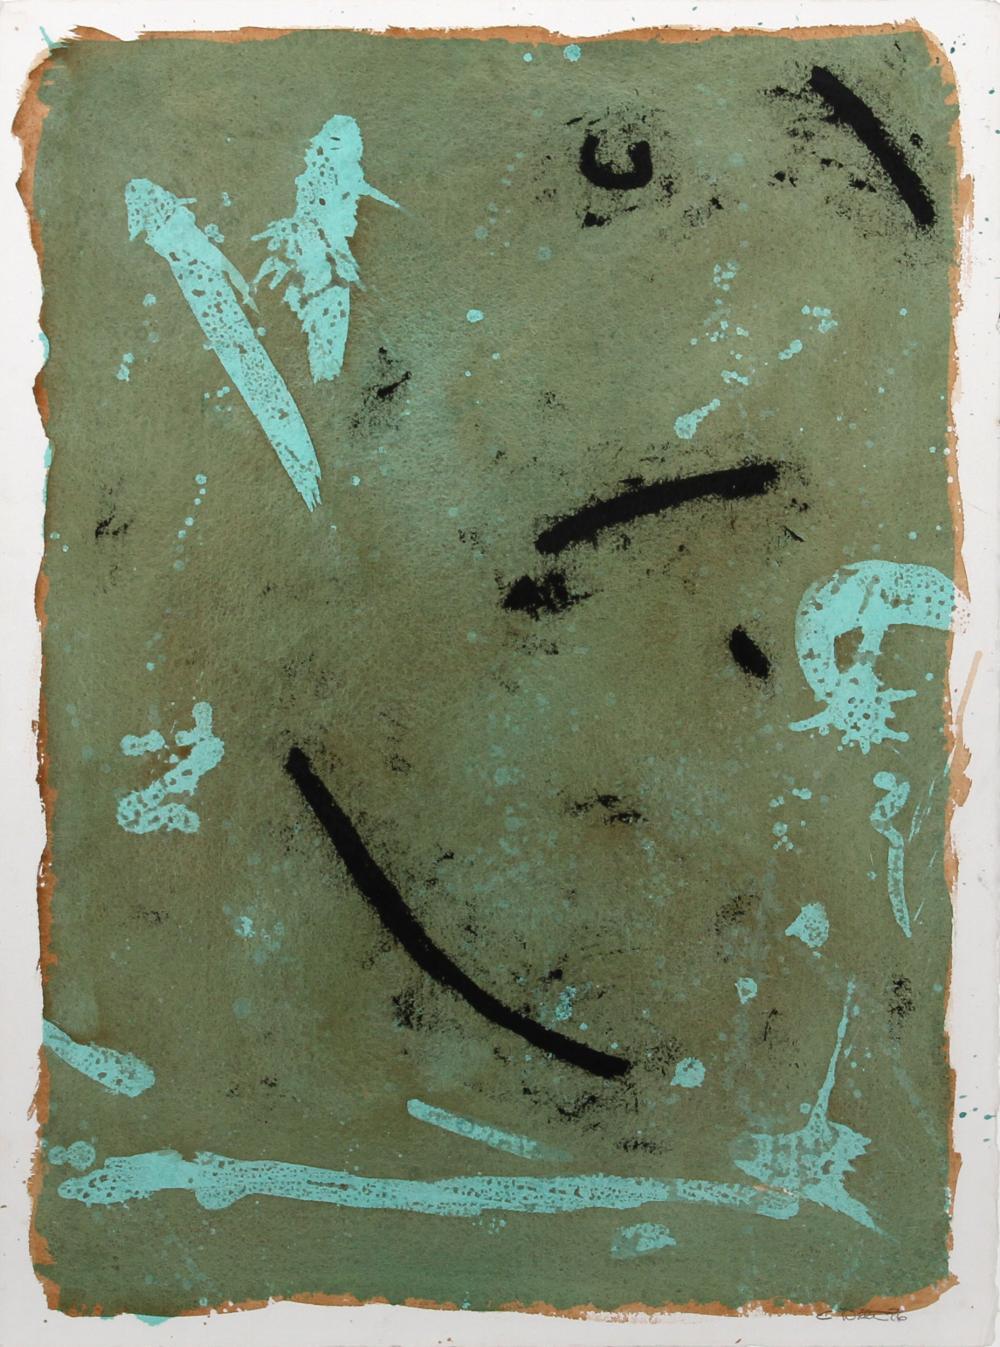 Kit (aka Christopher) White, Sweet Cyprus 2, Acrylic Painting